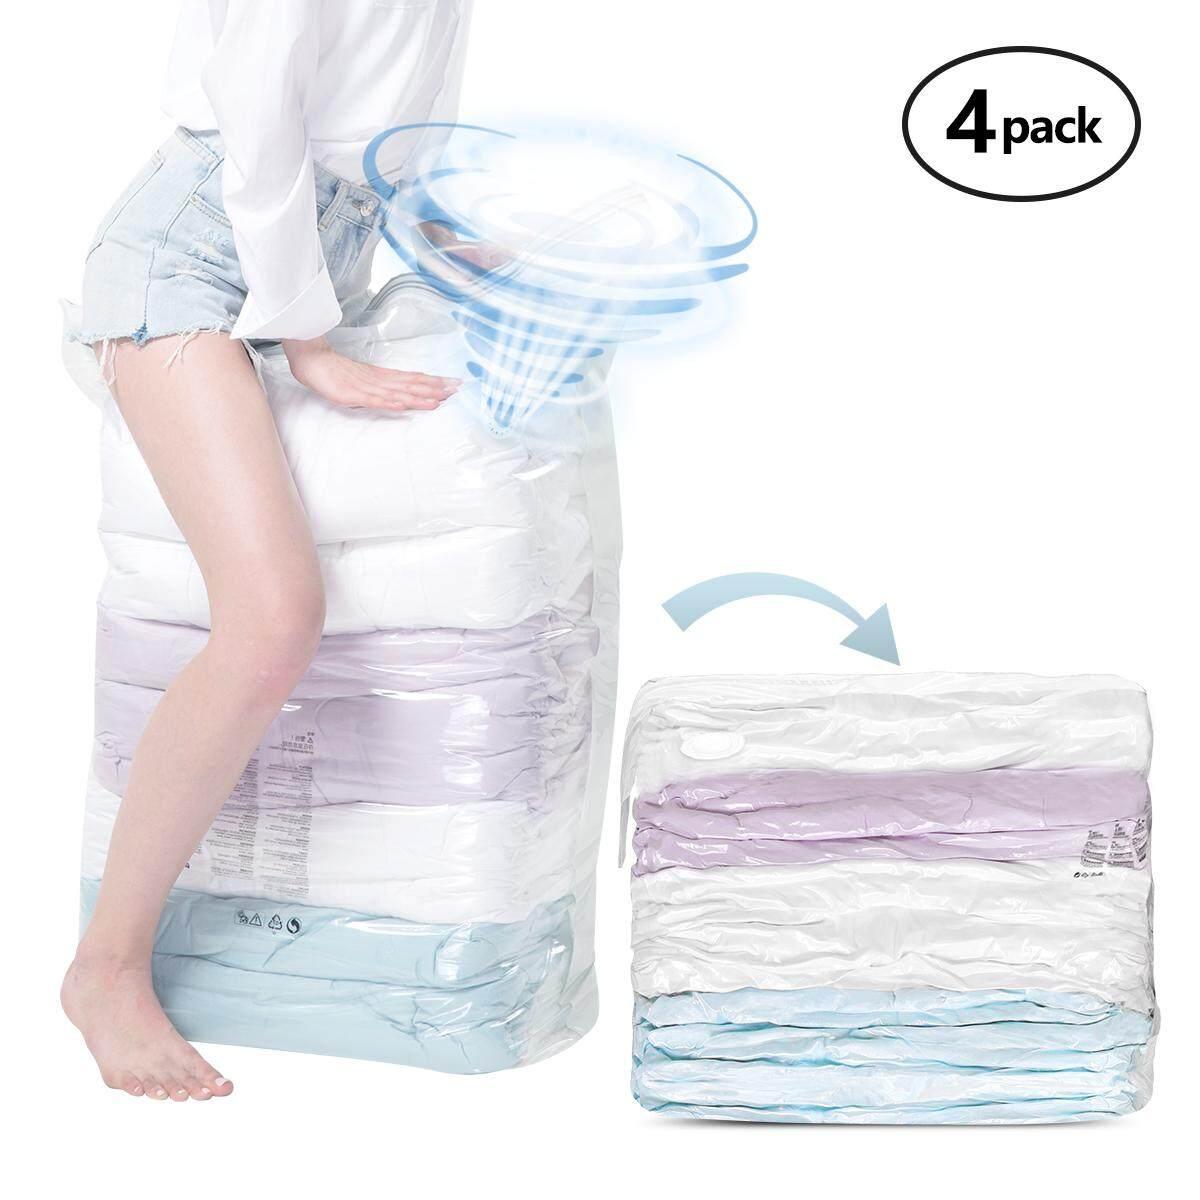 TAILI 4 Pack No Pump Needed Cube Vacuum Storage Compression Bags Travel Space Saver Bag Compressed Bag Mothproof Moistureproof Closet Organizer 50x70x30cm